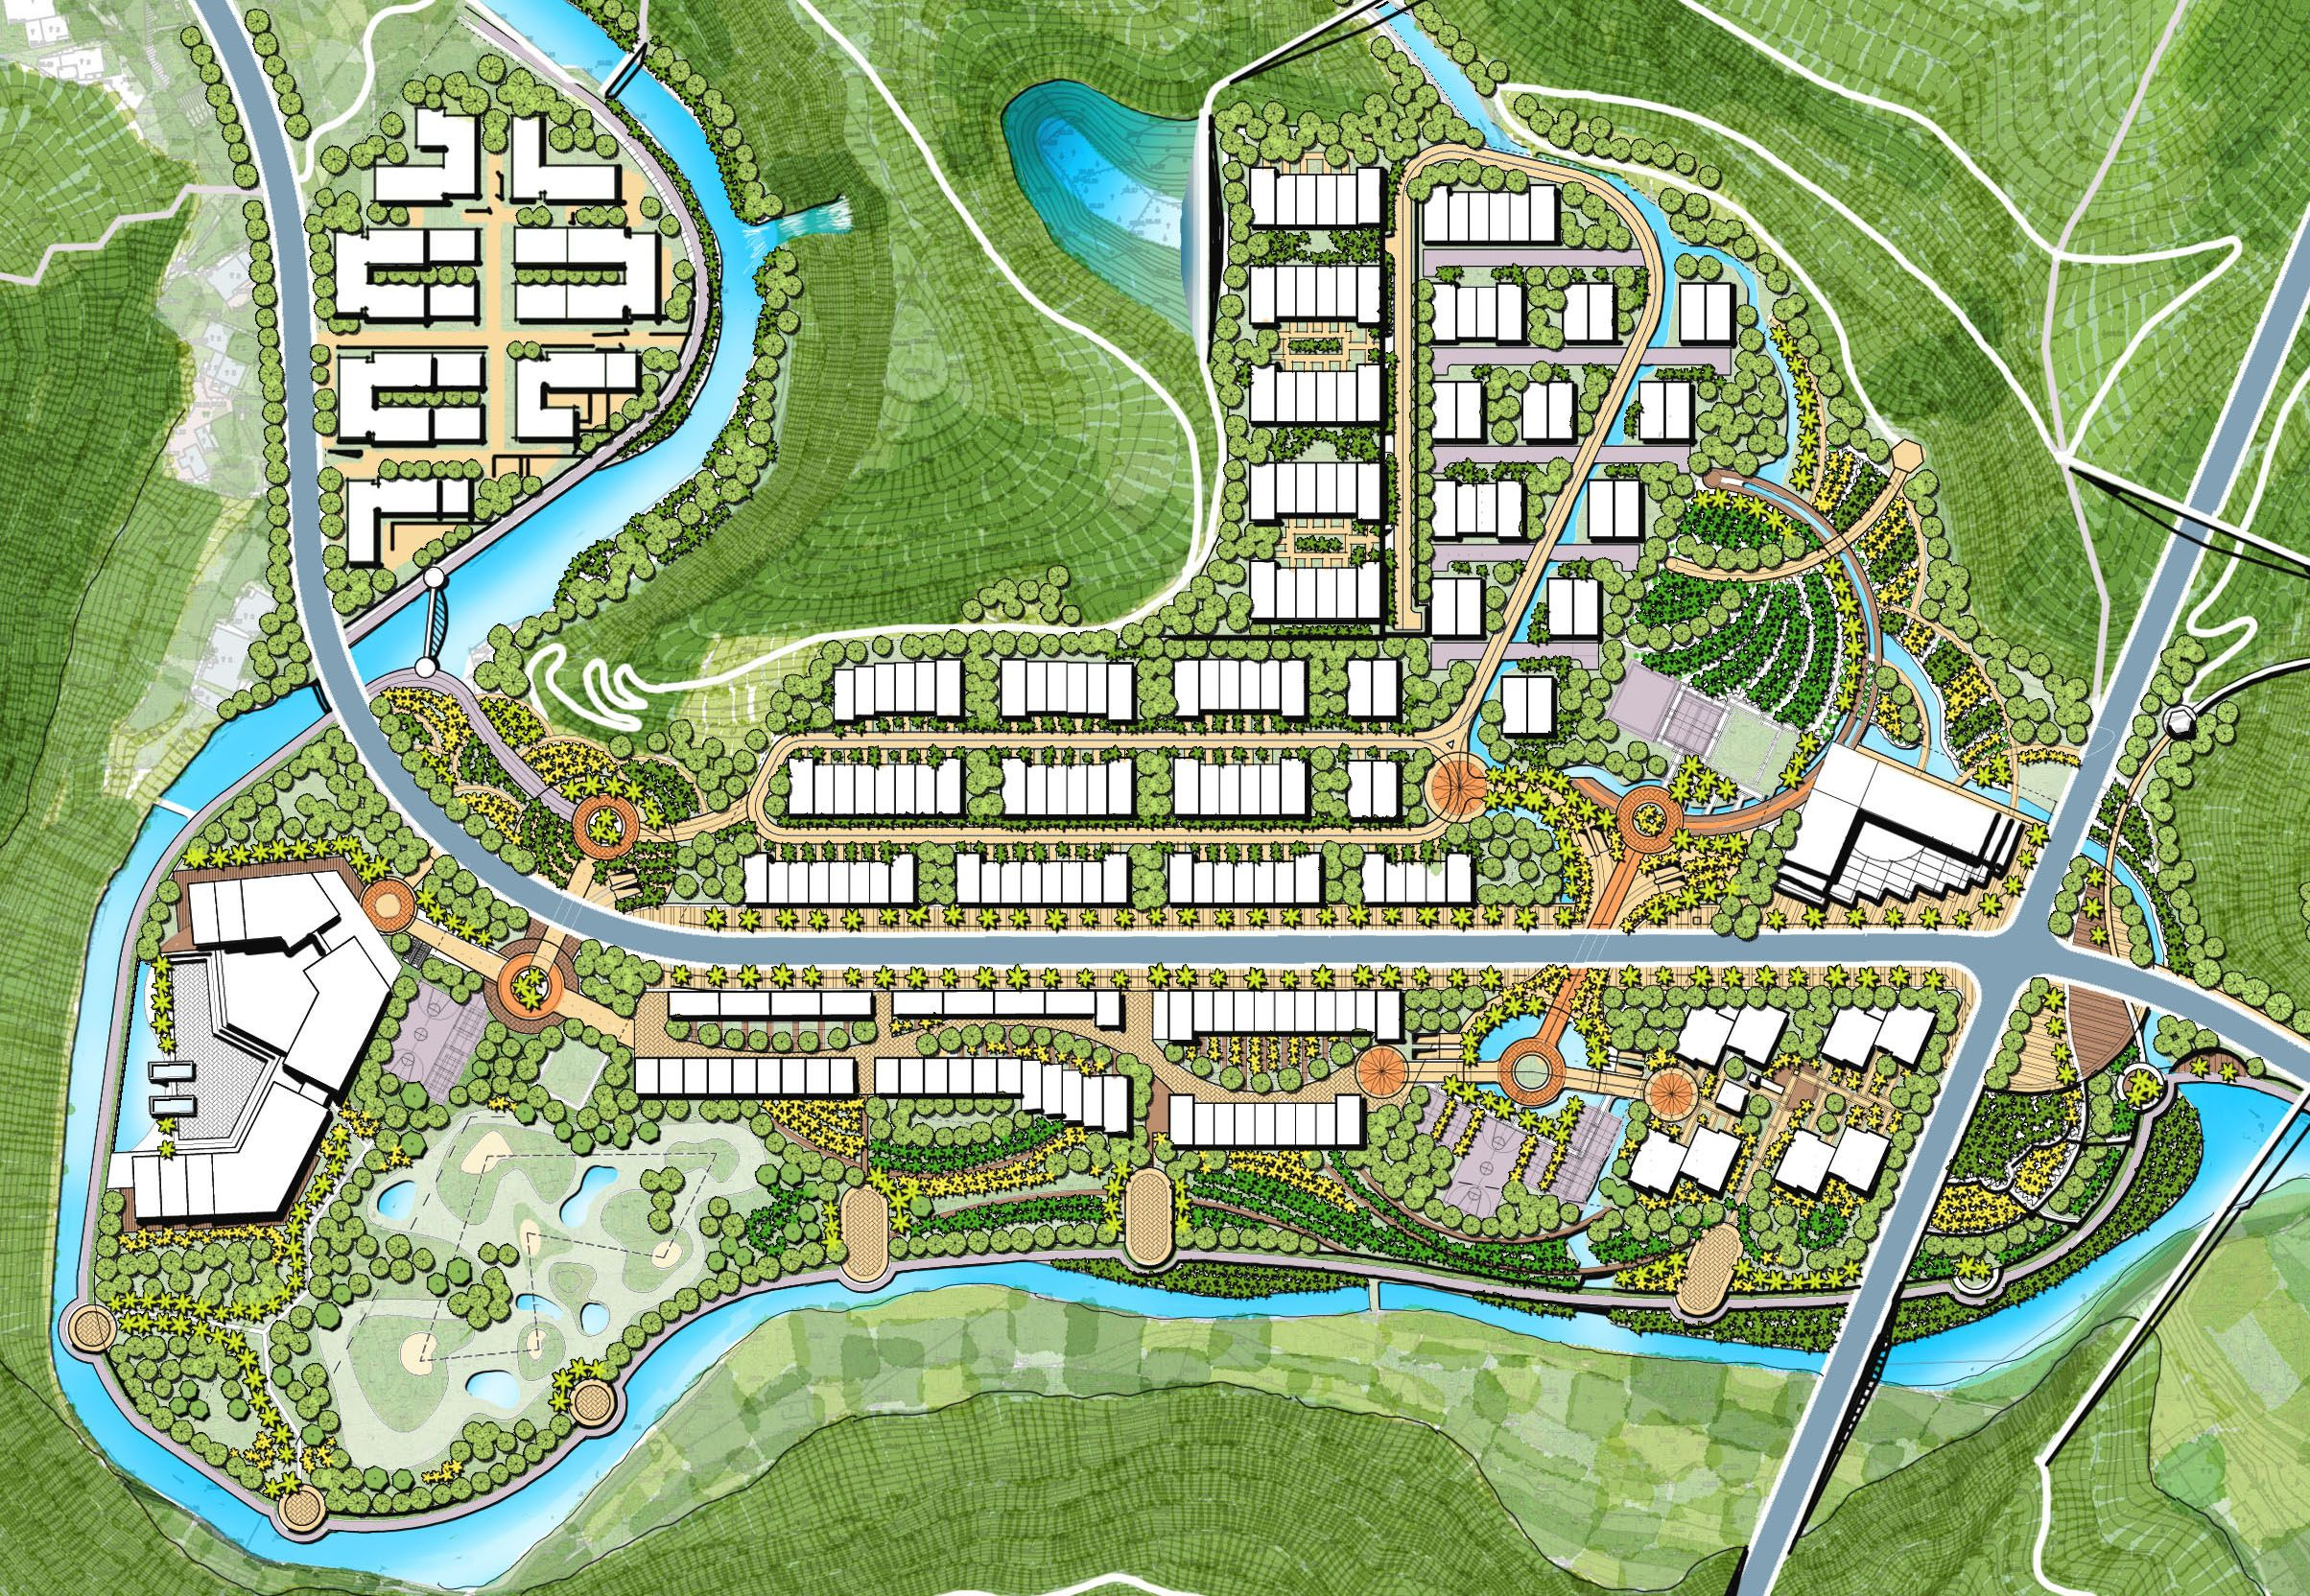 row housing development and landscape